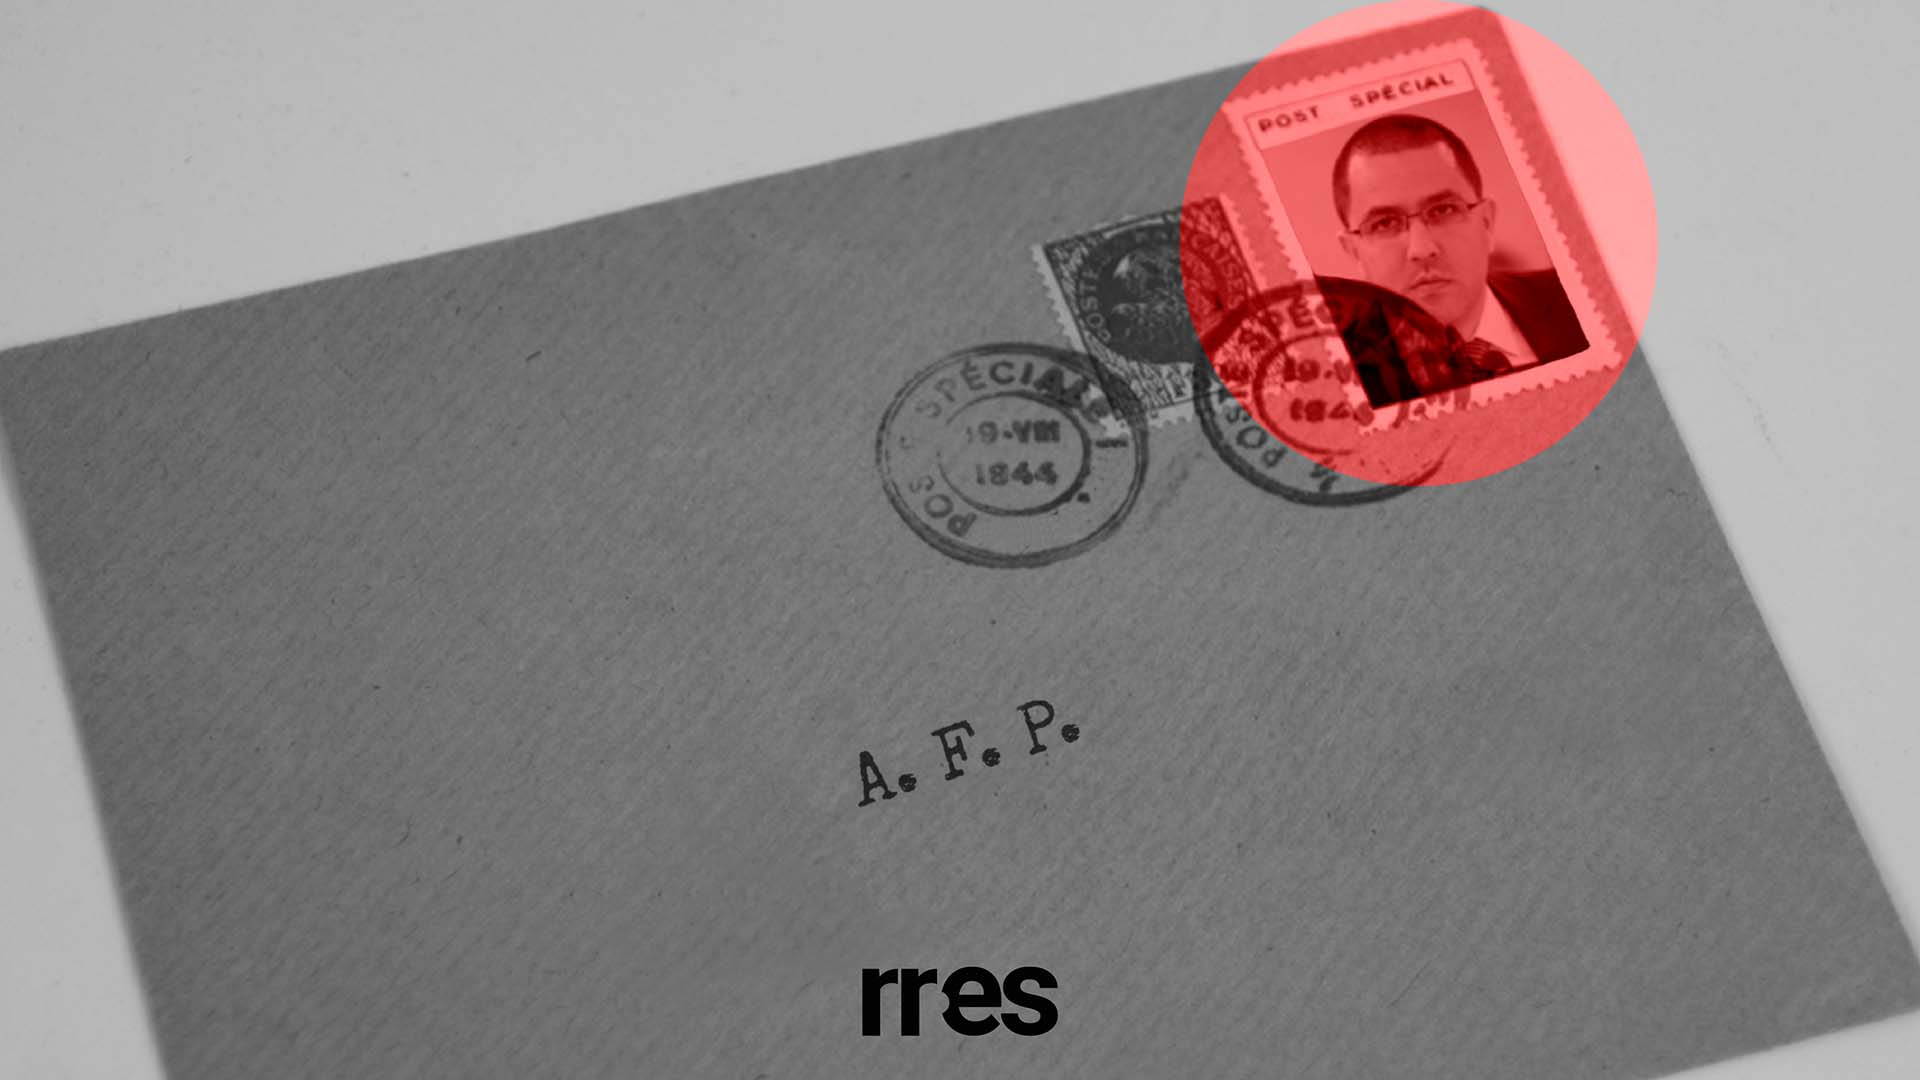 Runrunes de Bocaranda | La carta de Arreaza a la AFP… ¿de Cipriano Castro a Maduro?